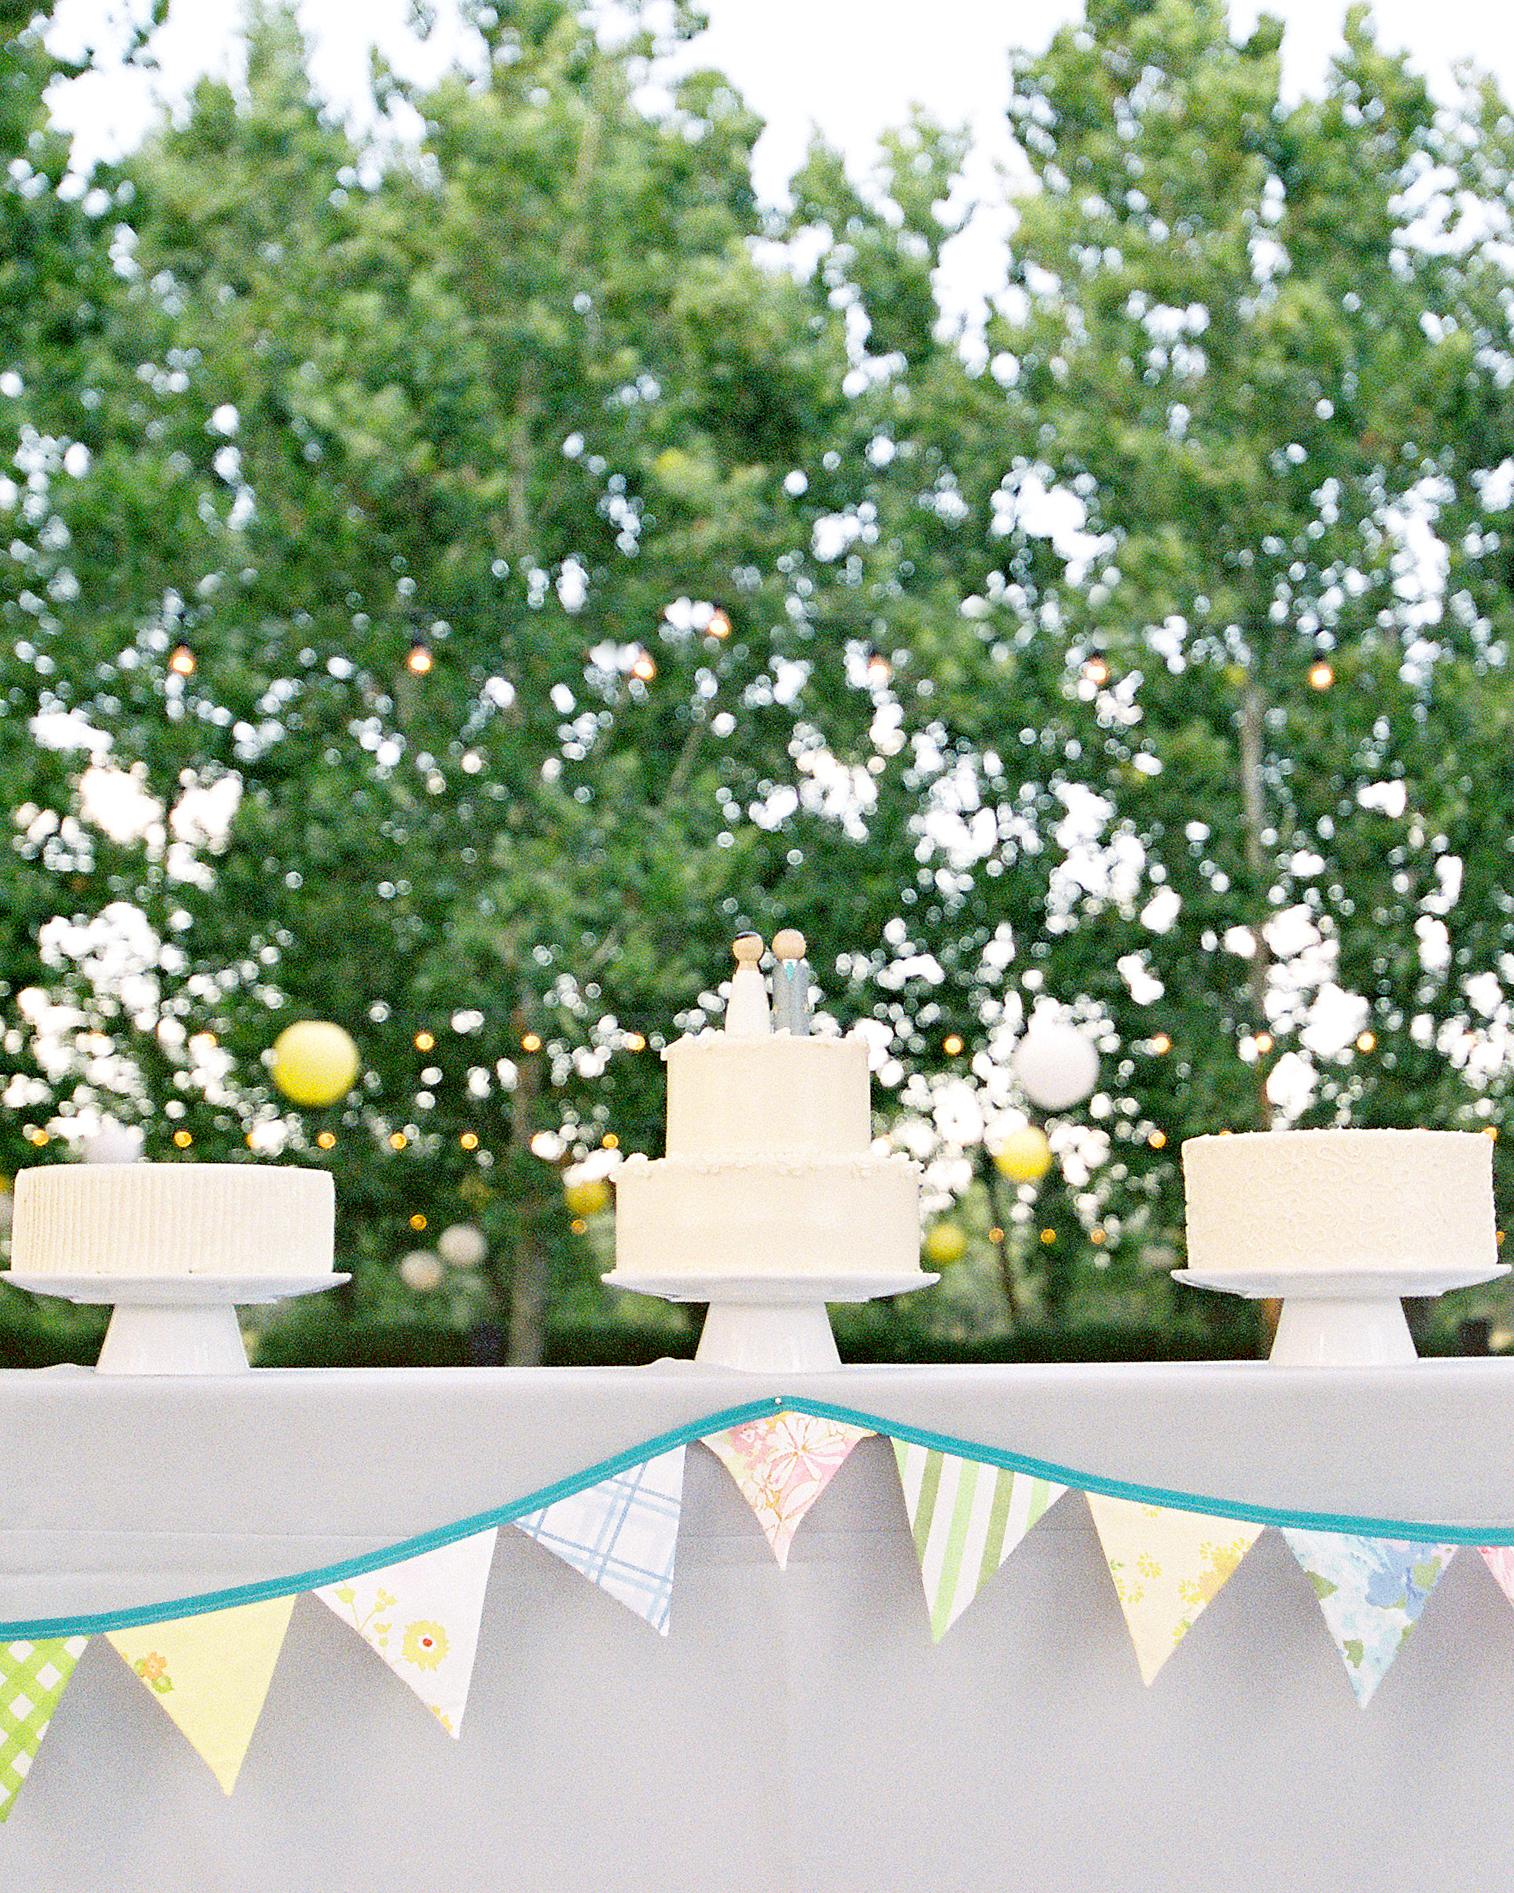 real-weddings-zoe-john-006740-R1-007-2.jpg